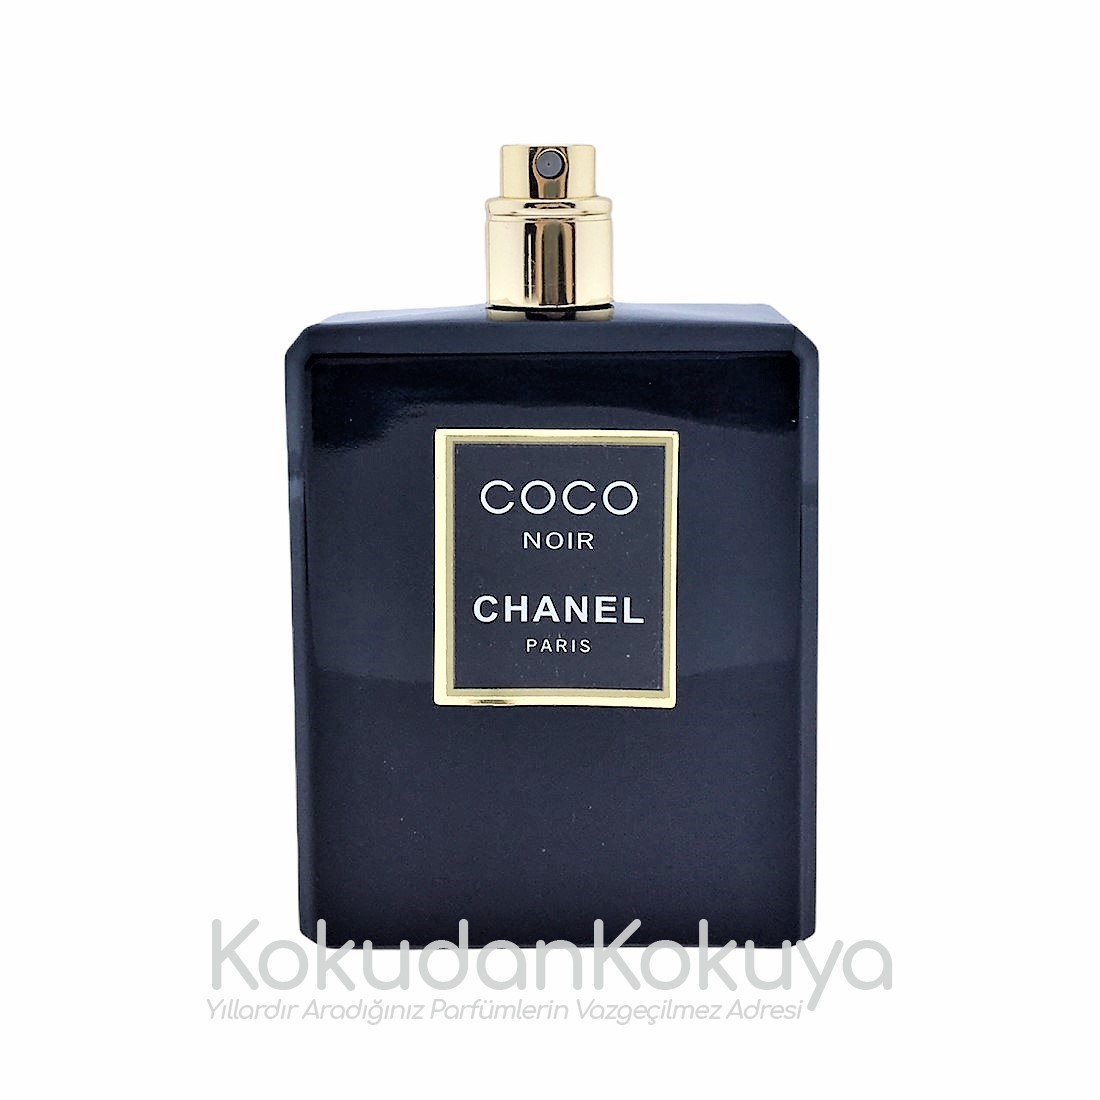 CHANEL Coco Noir Parfüm Kadın 100ml Eau De Parfum (EDP) Sprey